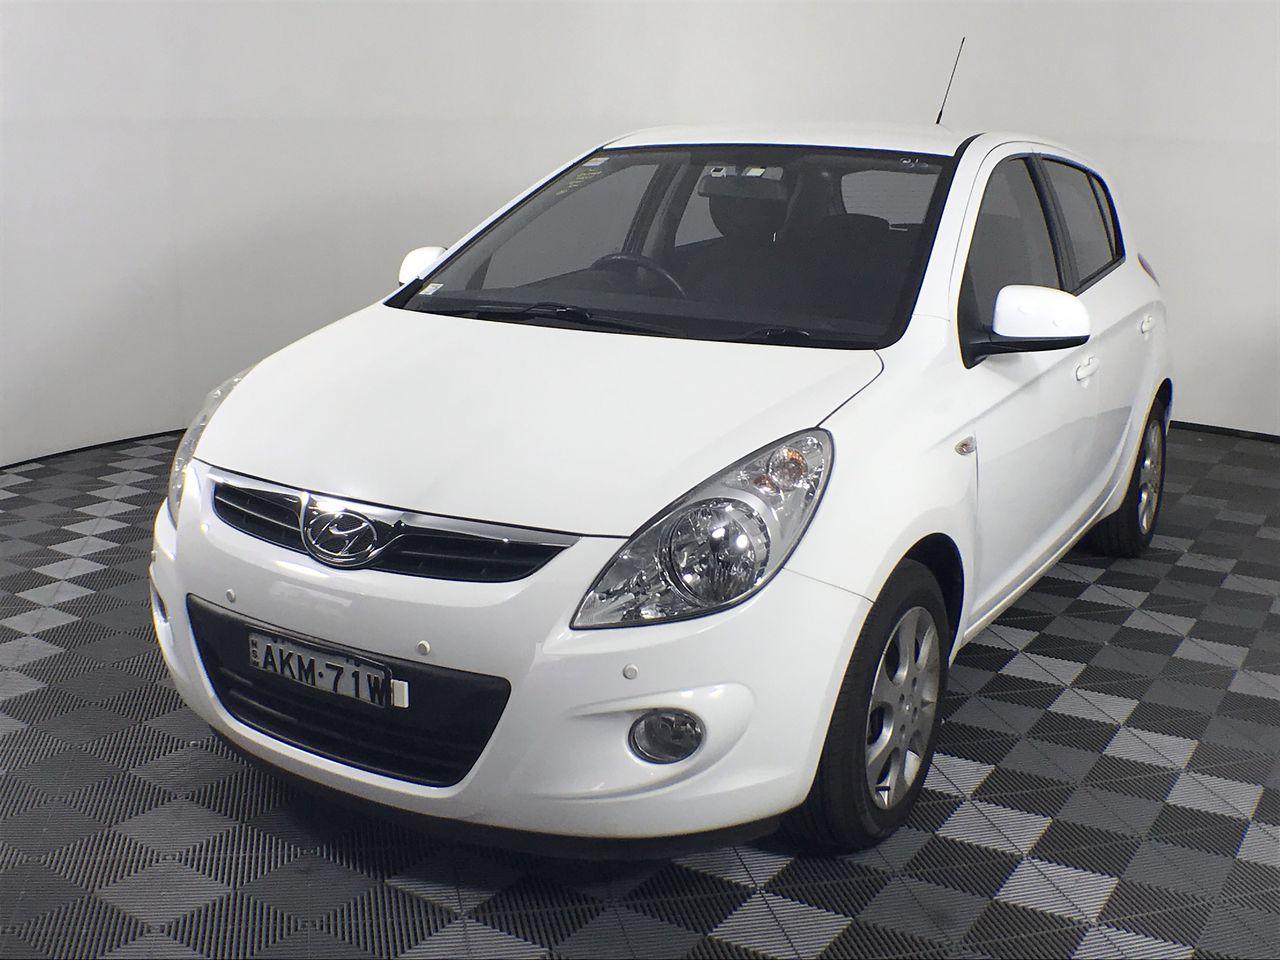 2011 Hyundai i20 Elite PB Automatic Hatchback 60,759km